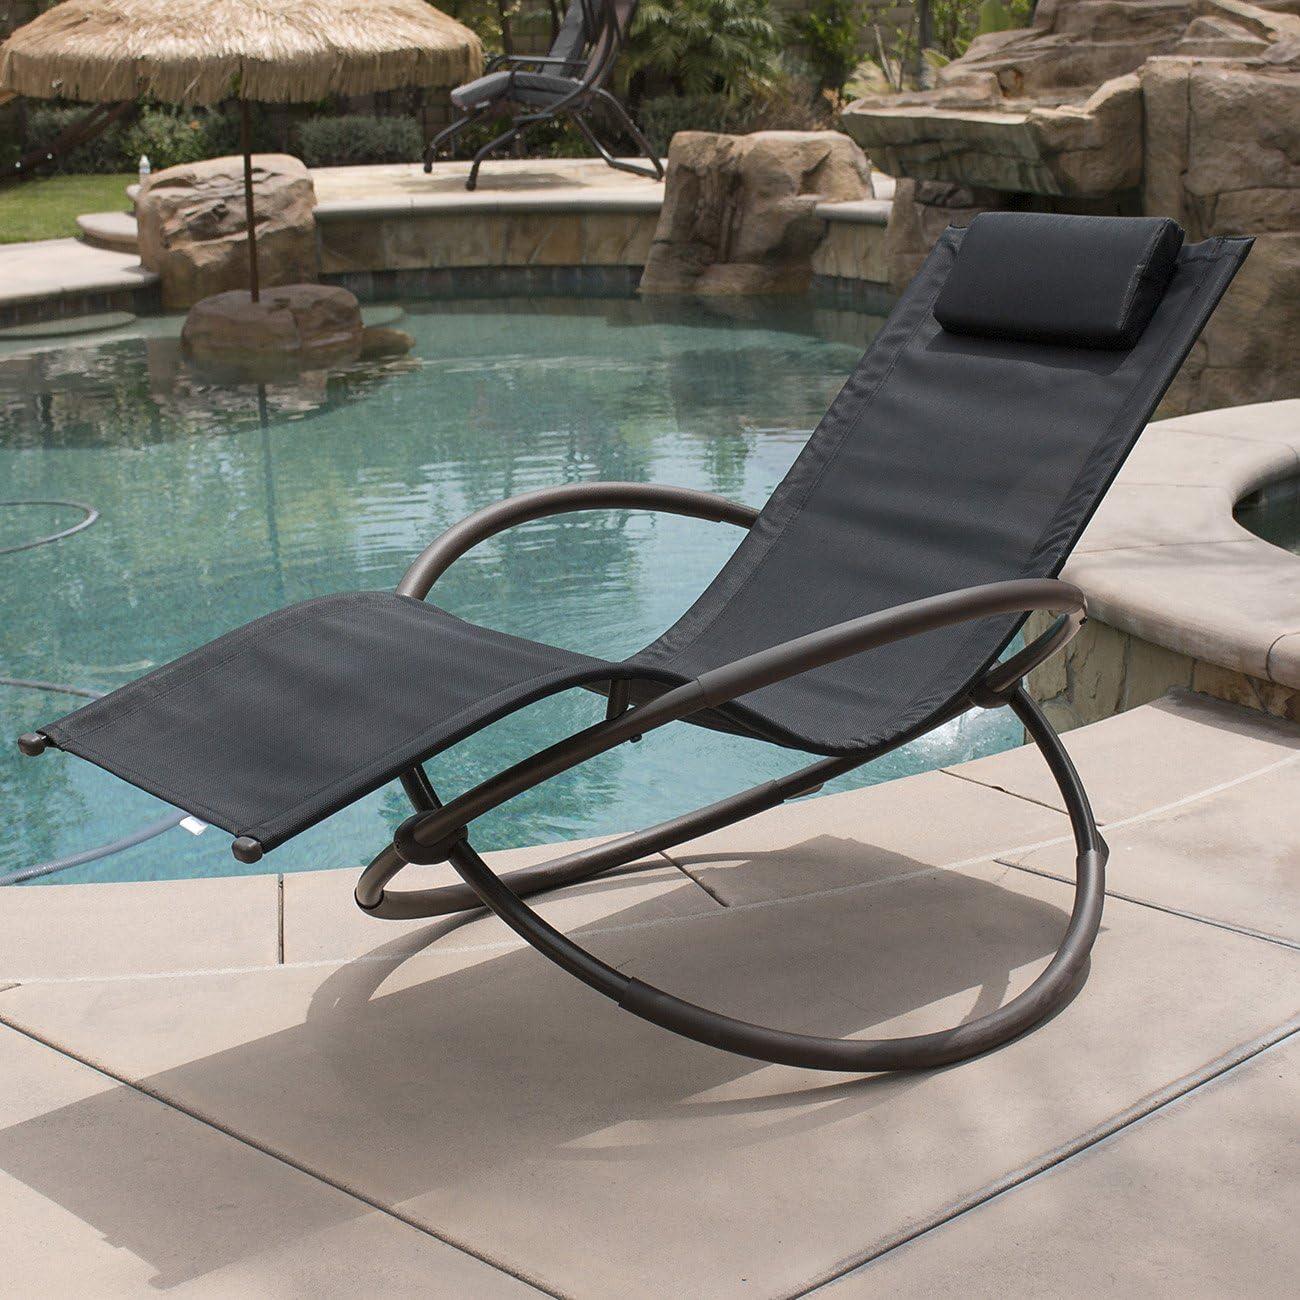 Belleze Zero Gravity Orbital Lounger Rocking Chair Outdoor Patio Yard Furniture, Black